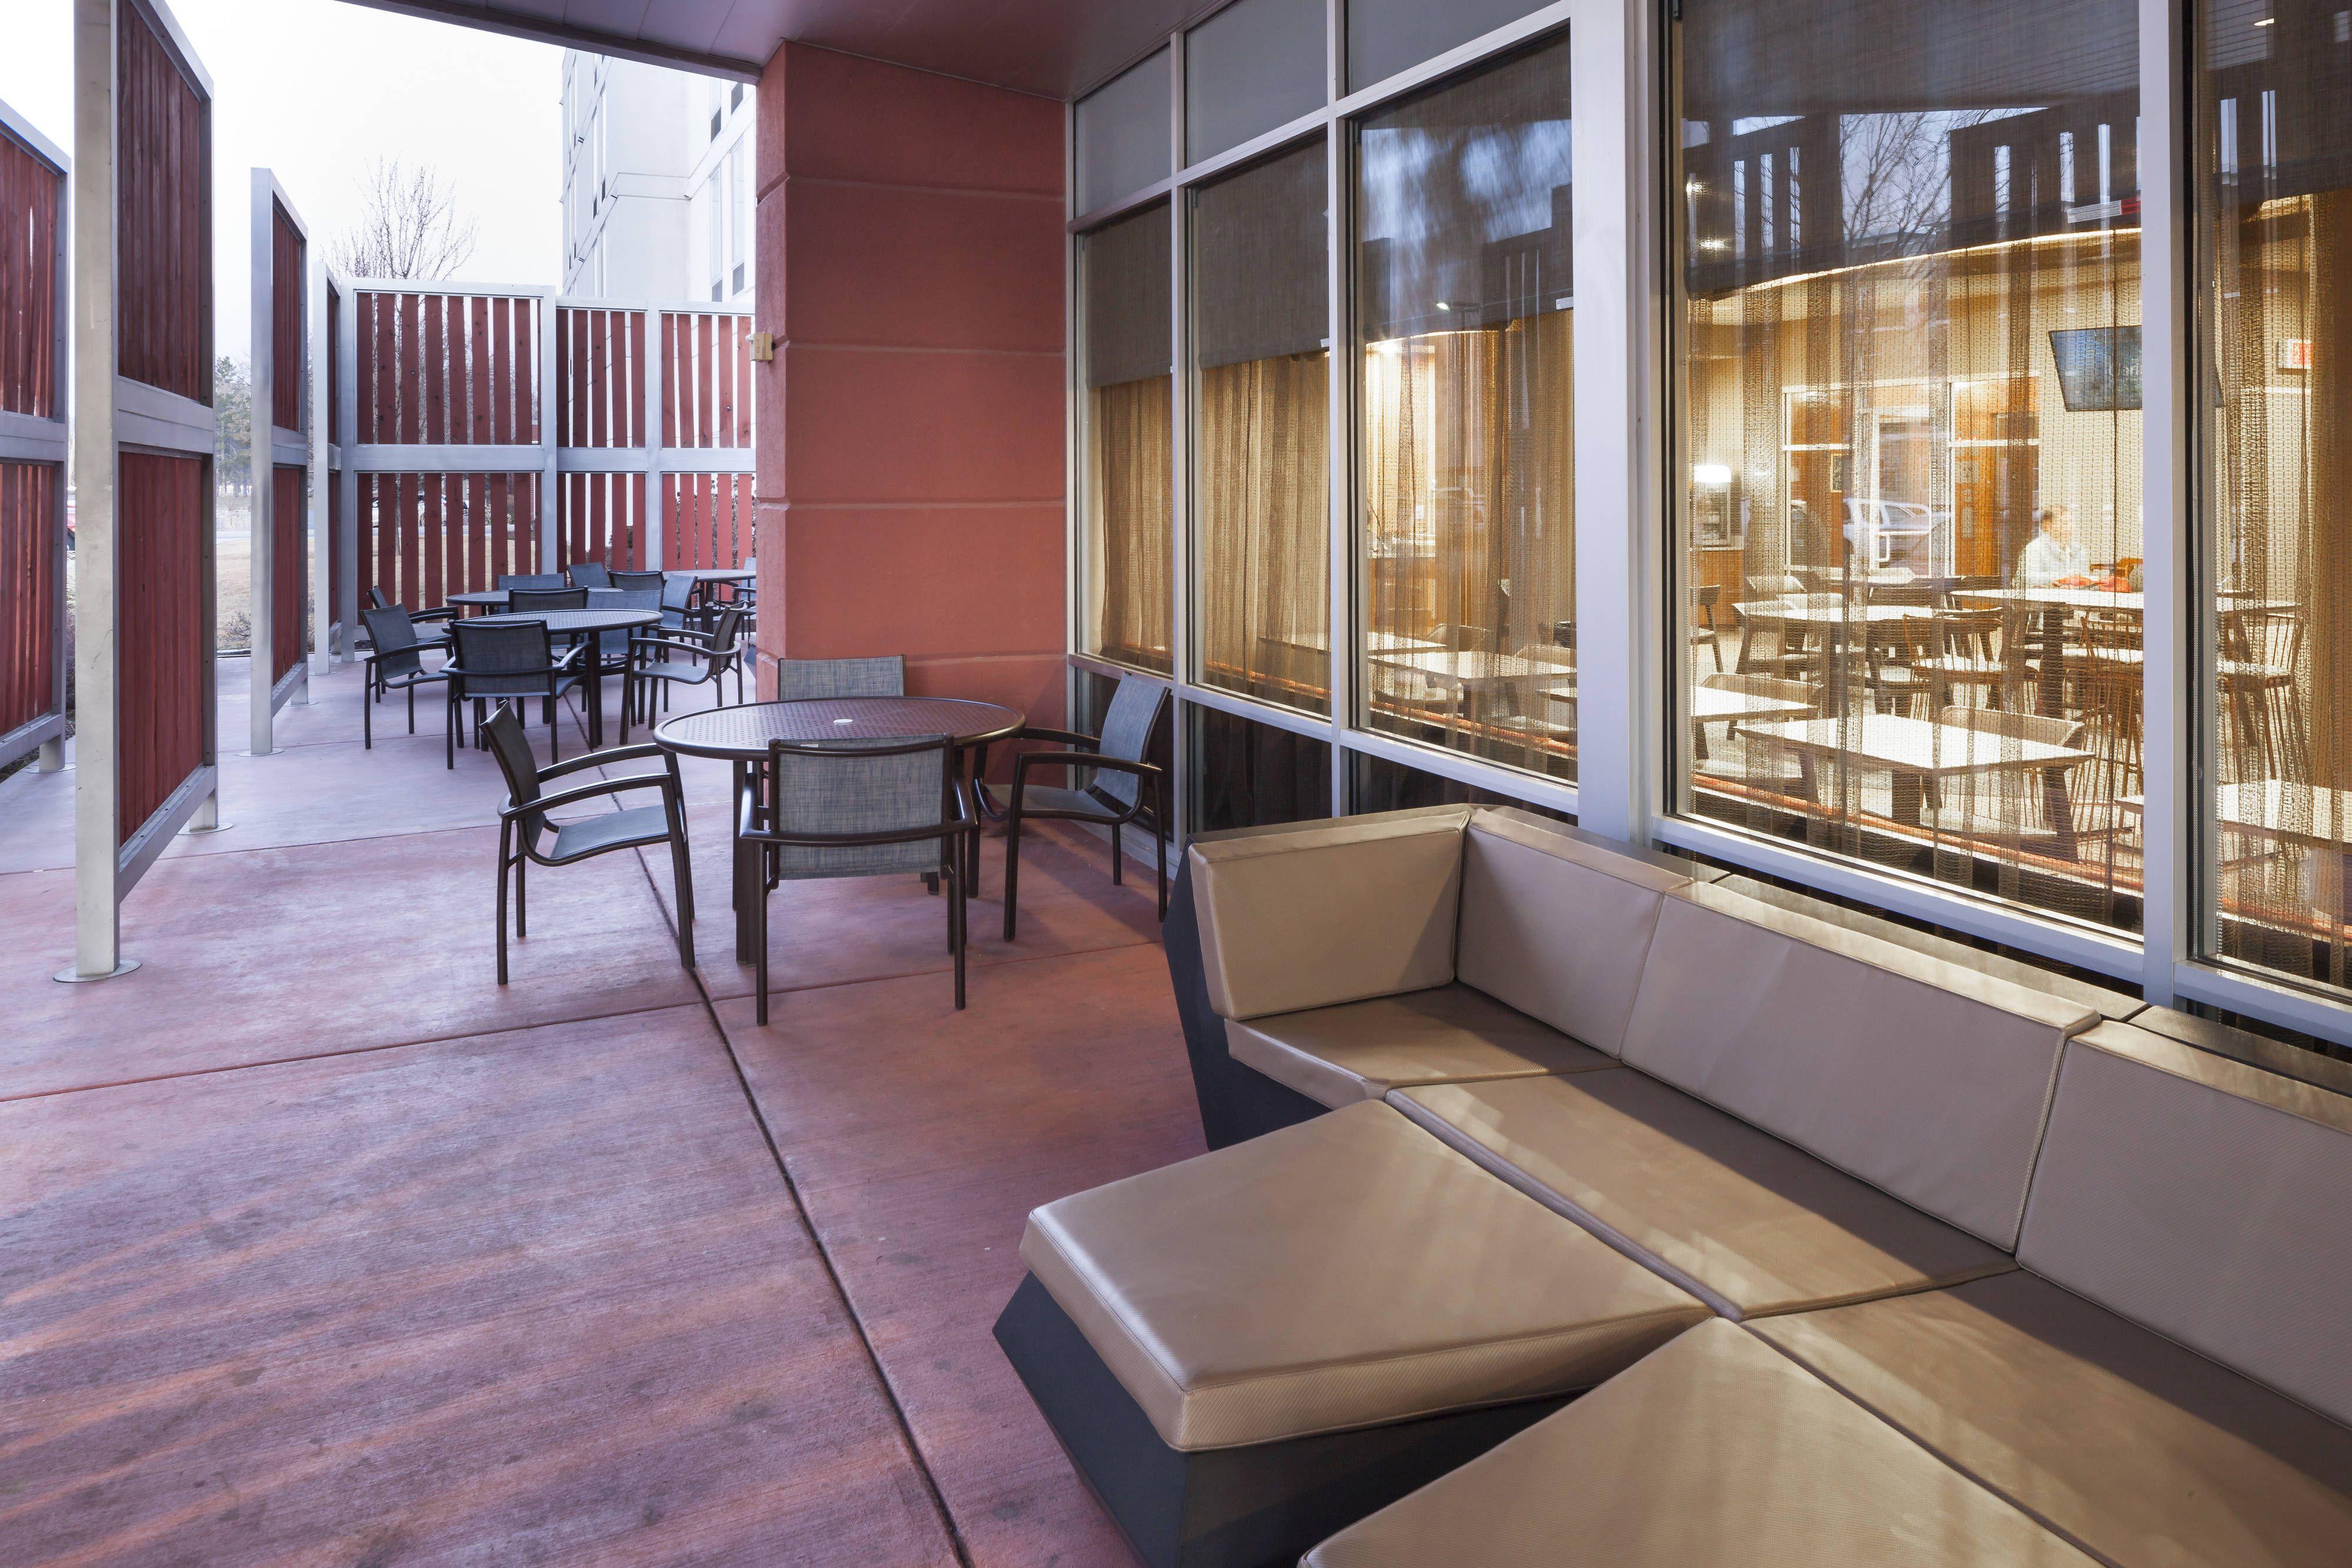 Springhill suites salt lake city airport outdoor patio comfort